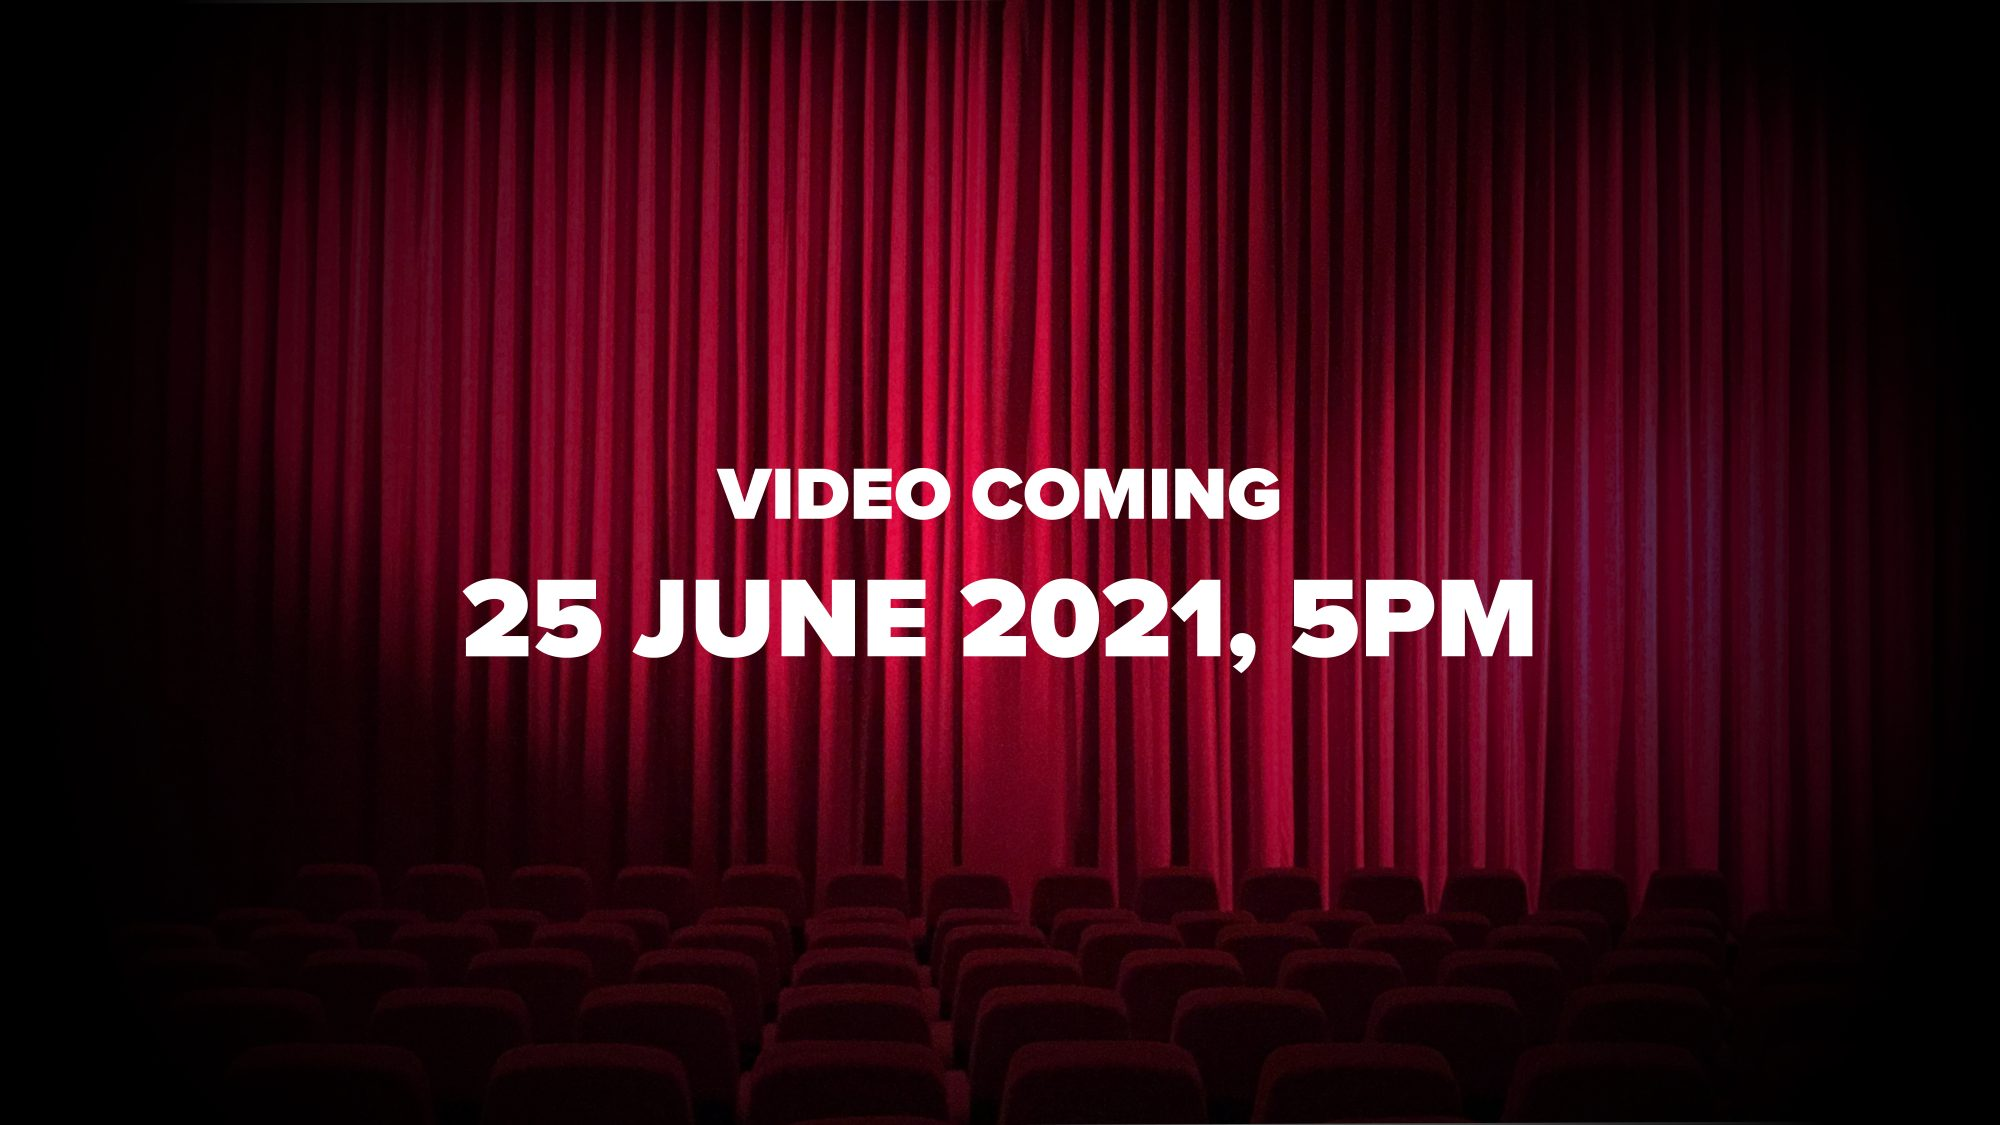 Video Coming 25 June 2021, 5pm